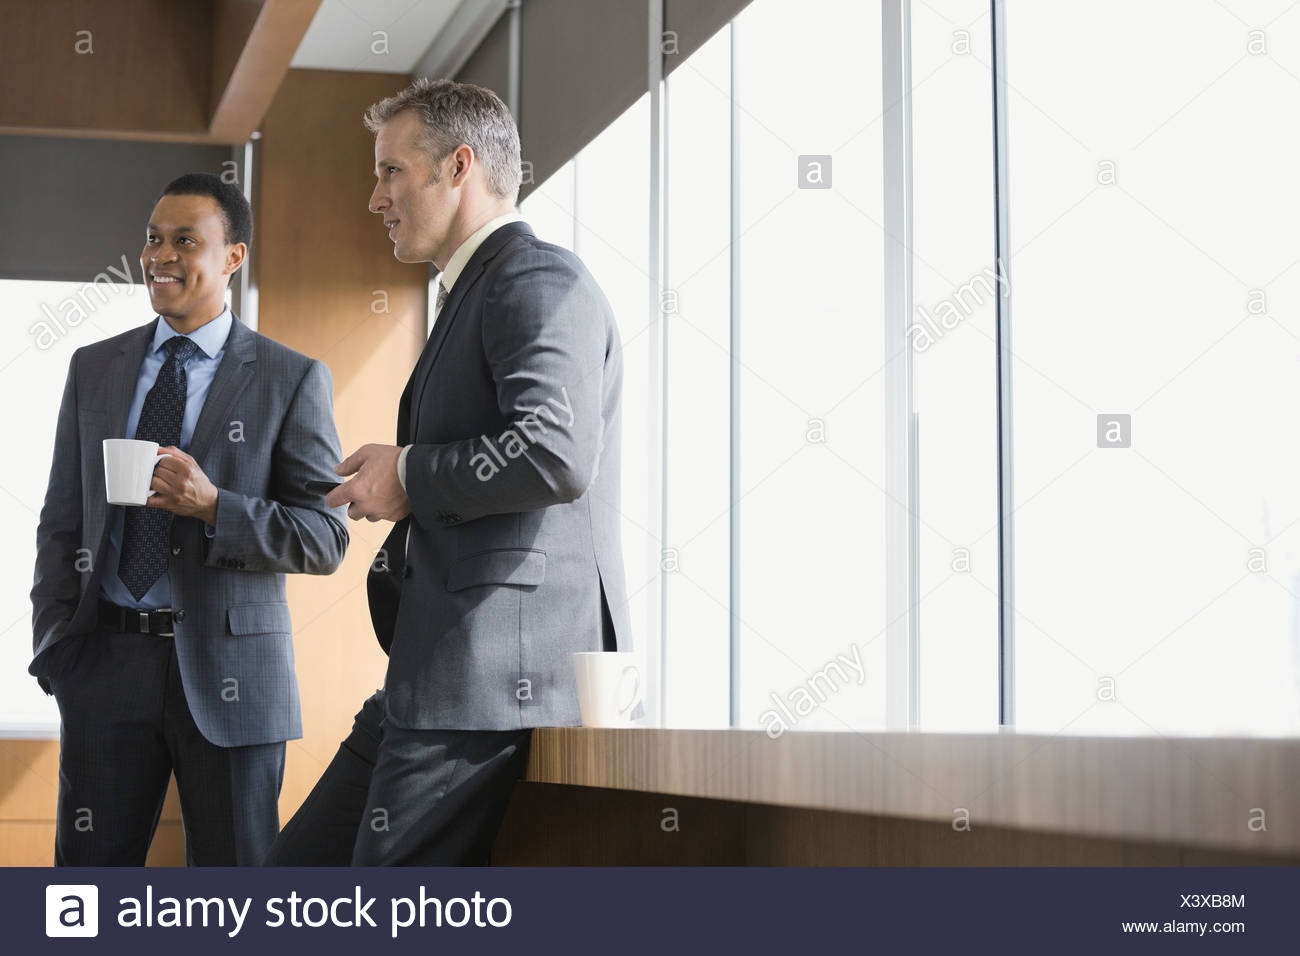 Businessmen talking in conference room - Stock Image